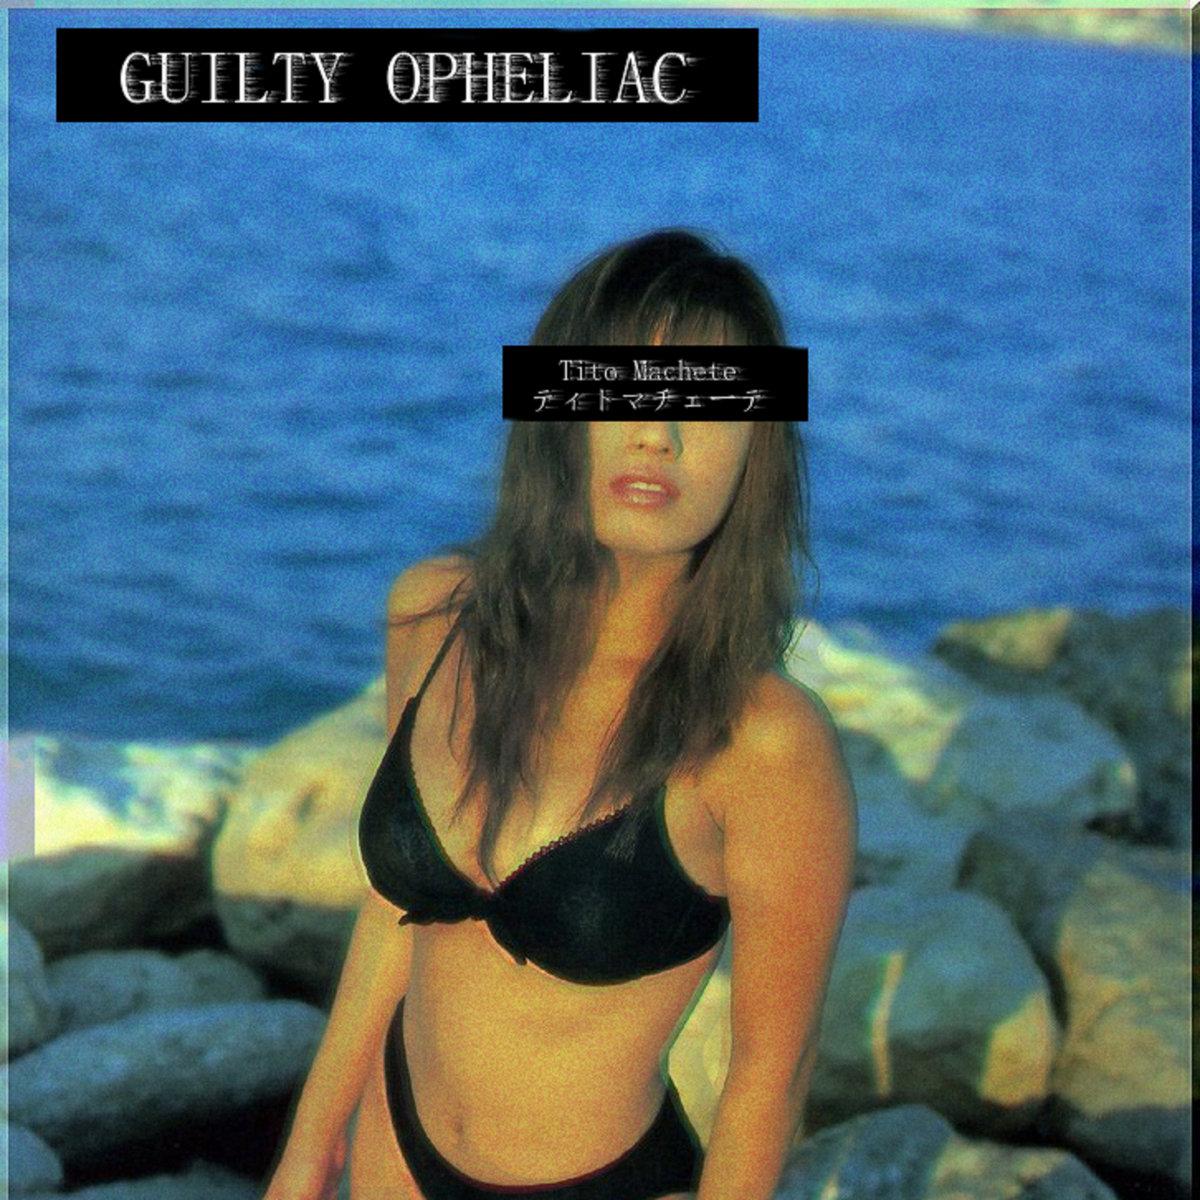 tito-machete-copertina-ostia-lido-1989-vaporwave-roma-guilty opheliac